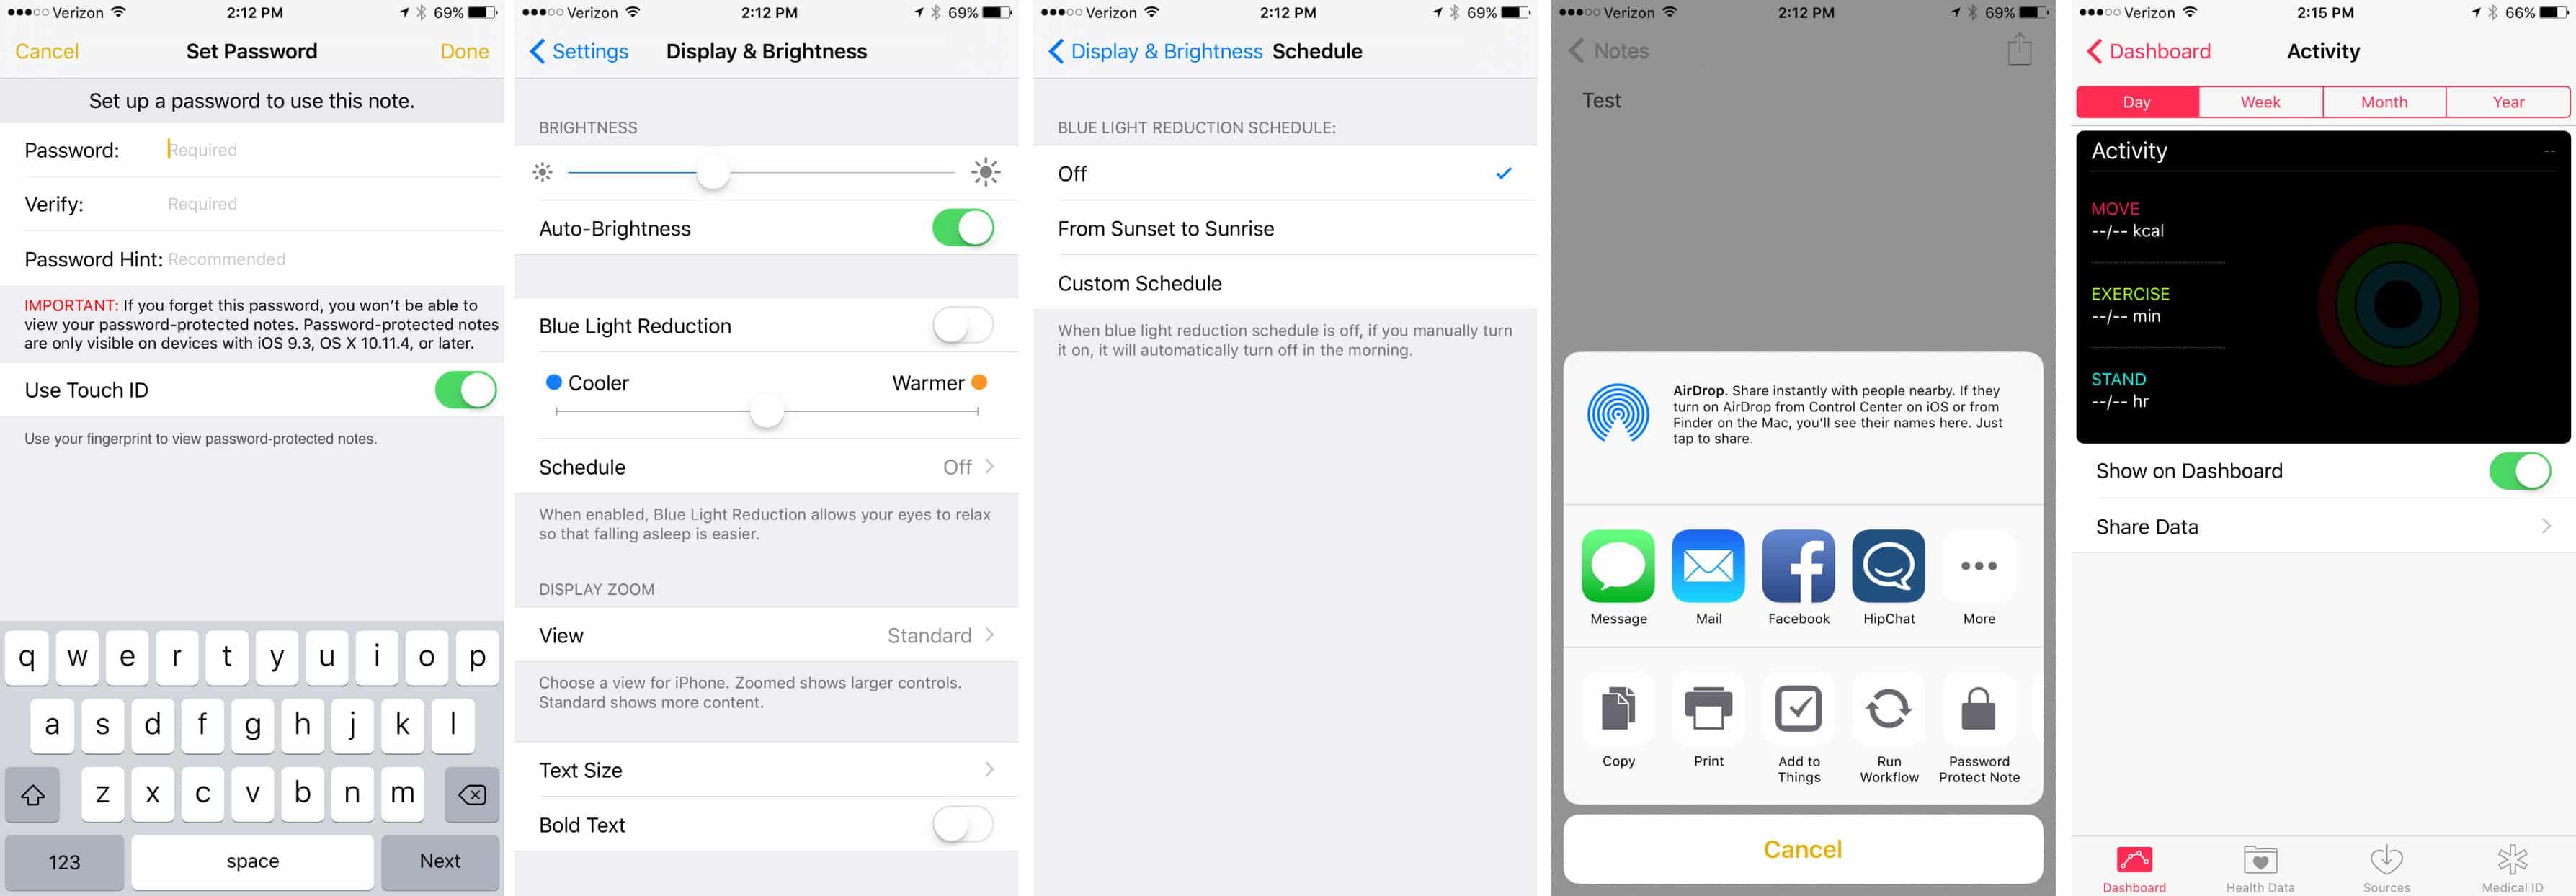 zmeny---iOS9.3---SvetApple1